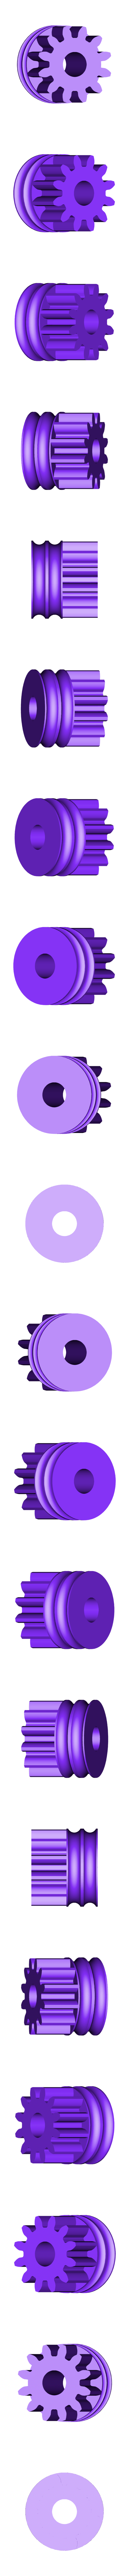 Gear_Wheel.stl Download free STL file Lady Buggy • 3D printer object, gzumwalt